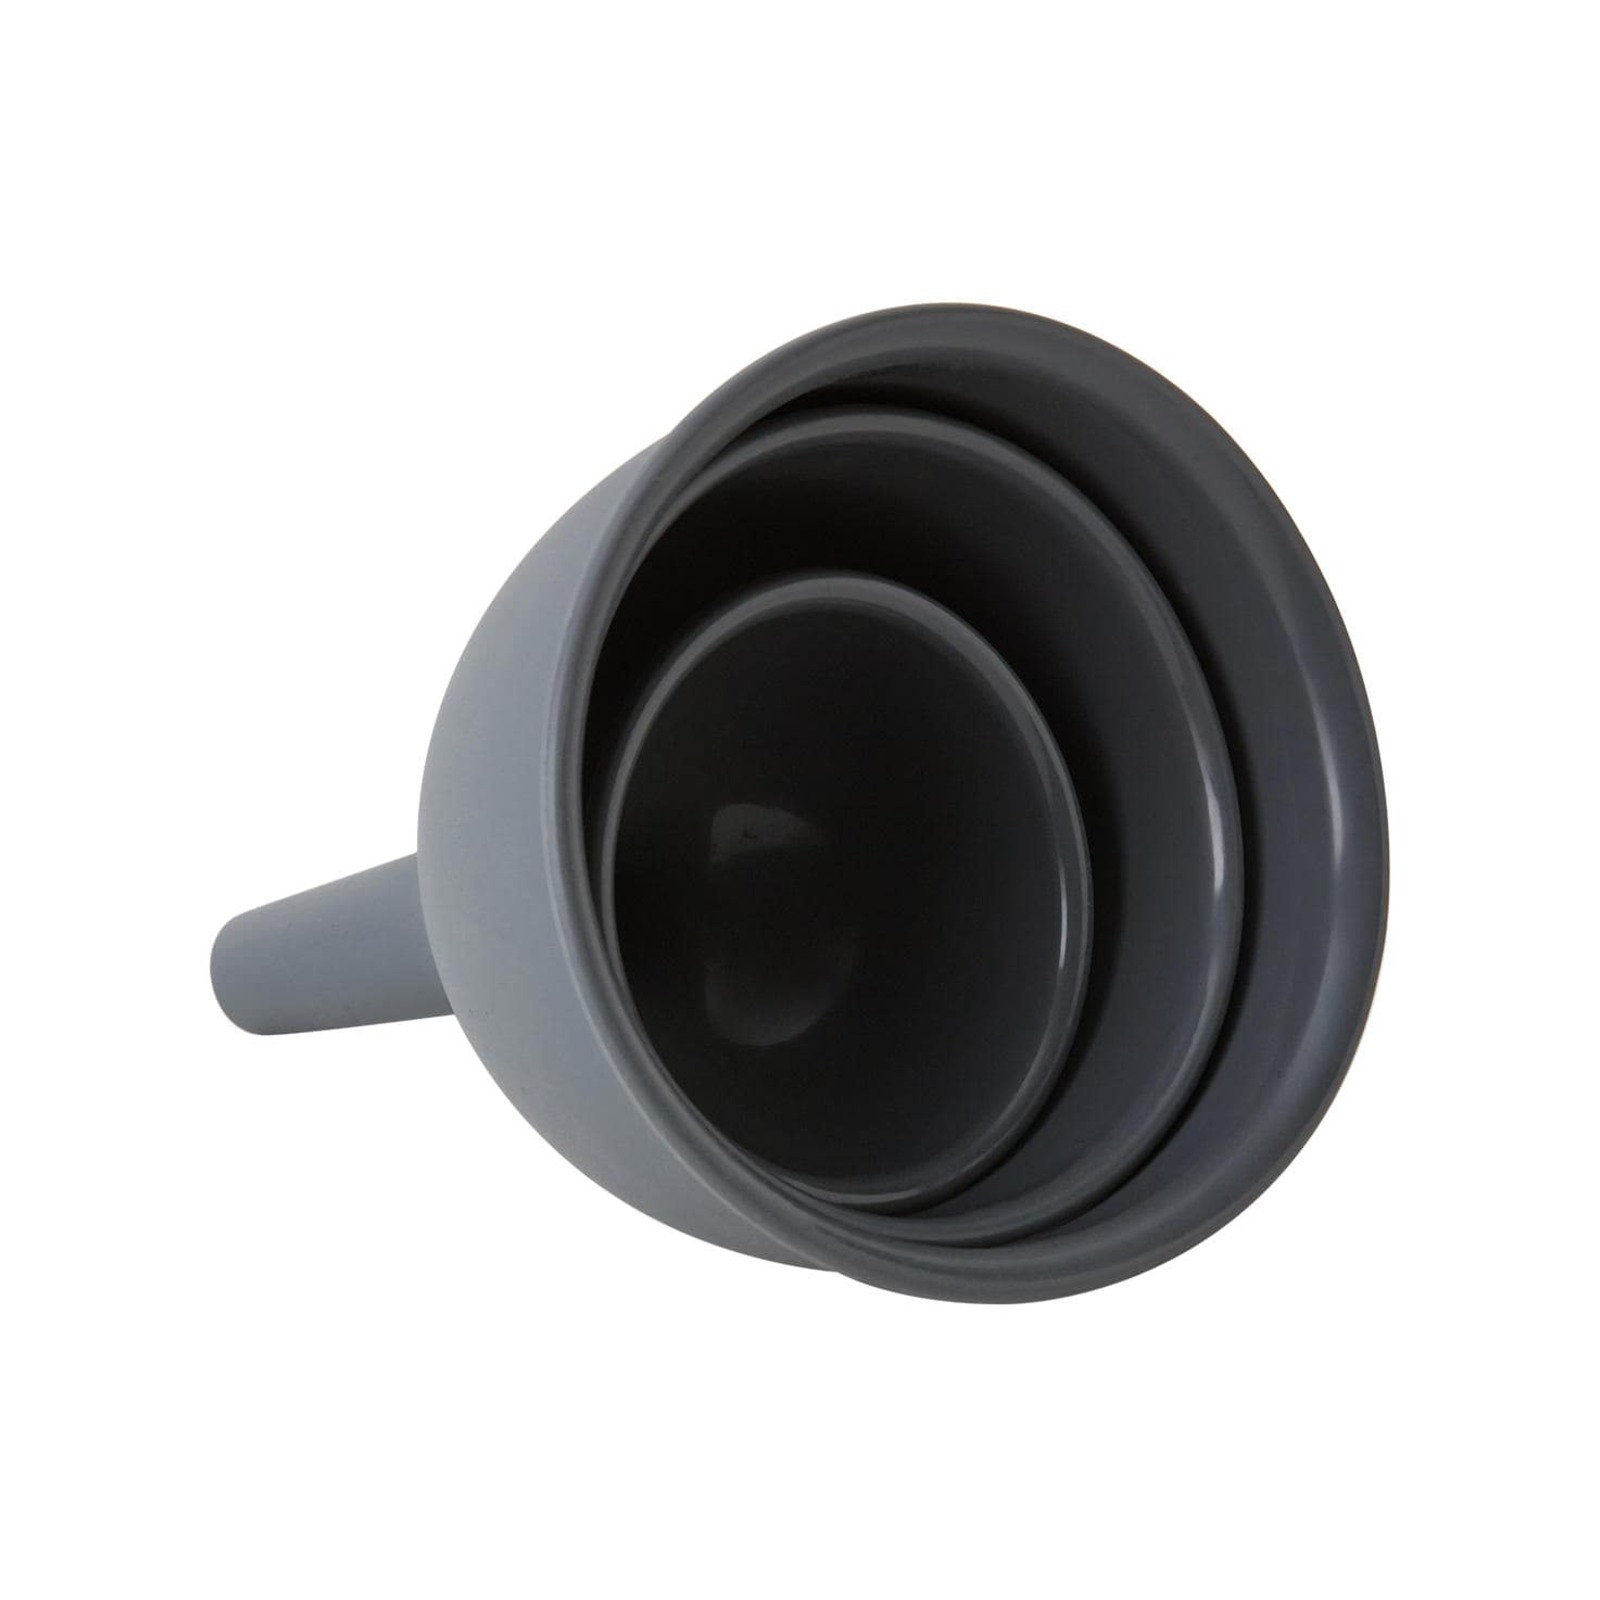 Kitchen Pro Oslo 3pc Silicone Funnel Set Charcoal